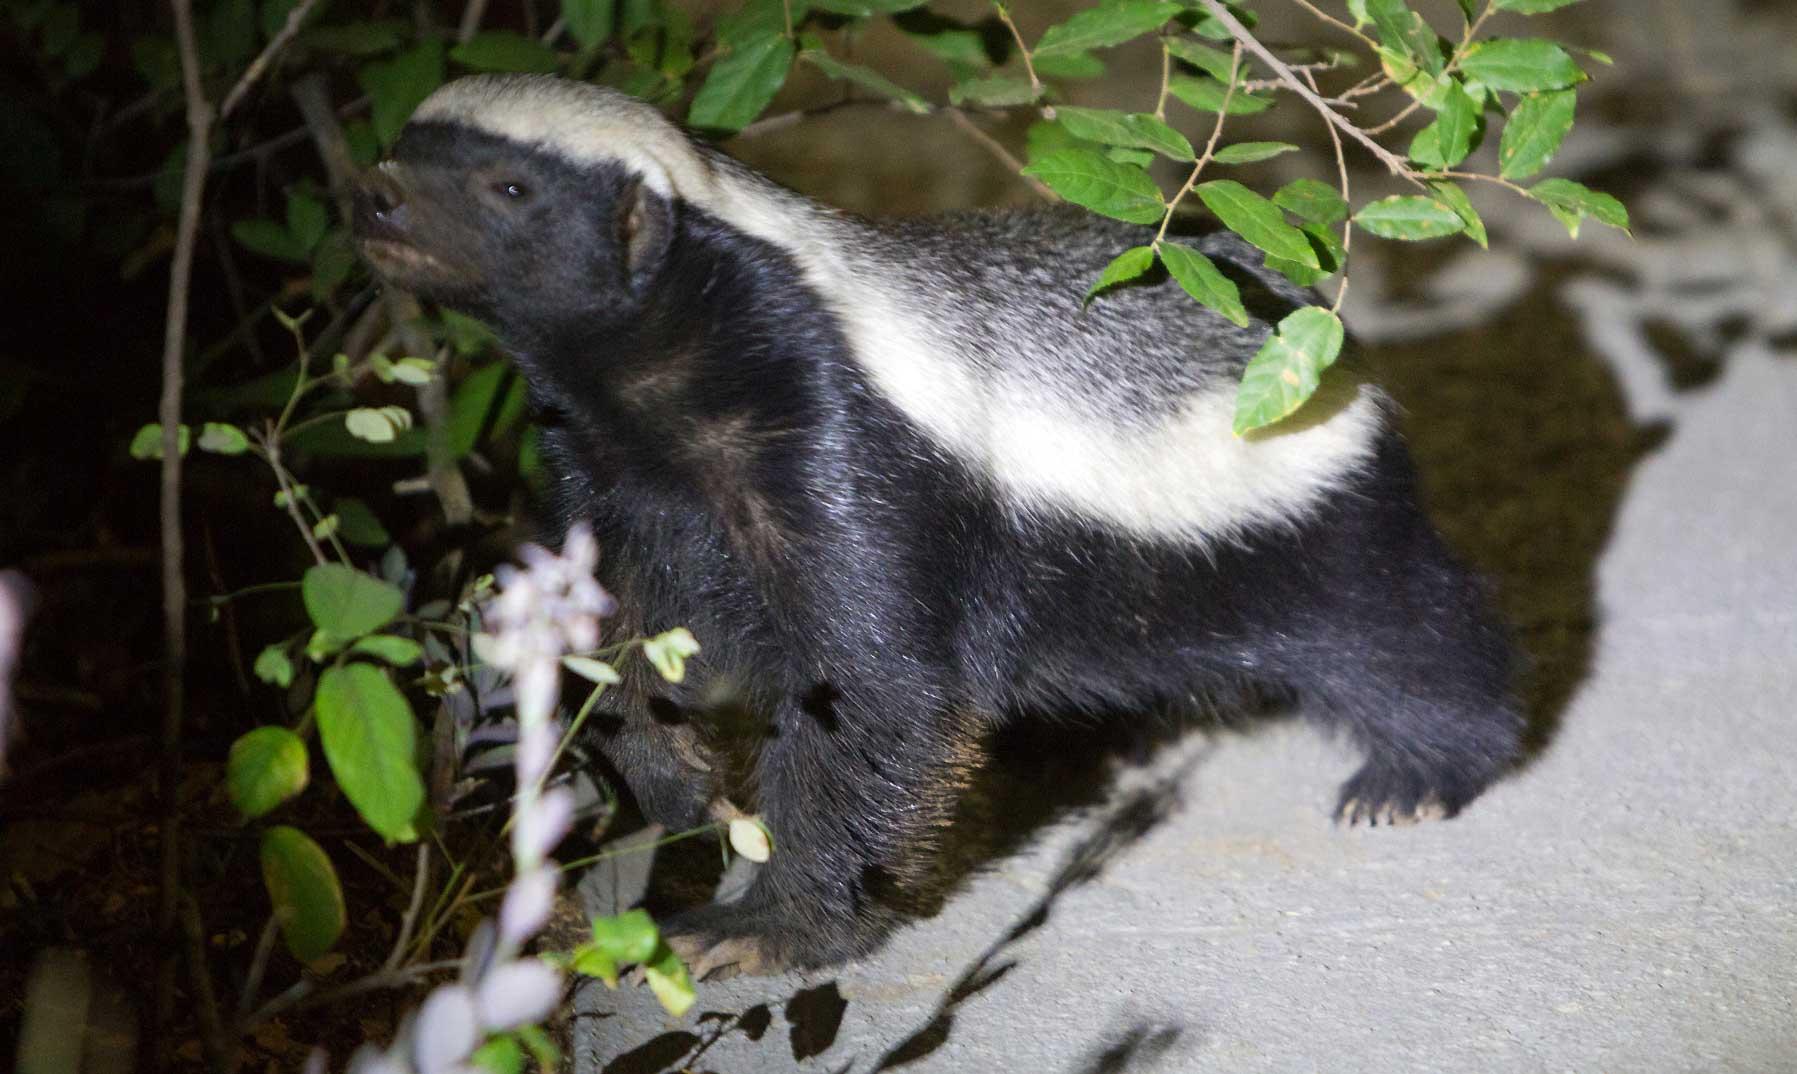 Honey Badgers: 10 Facts About Africa's Cheekiest Species